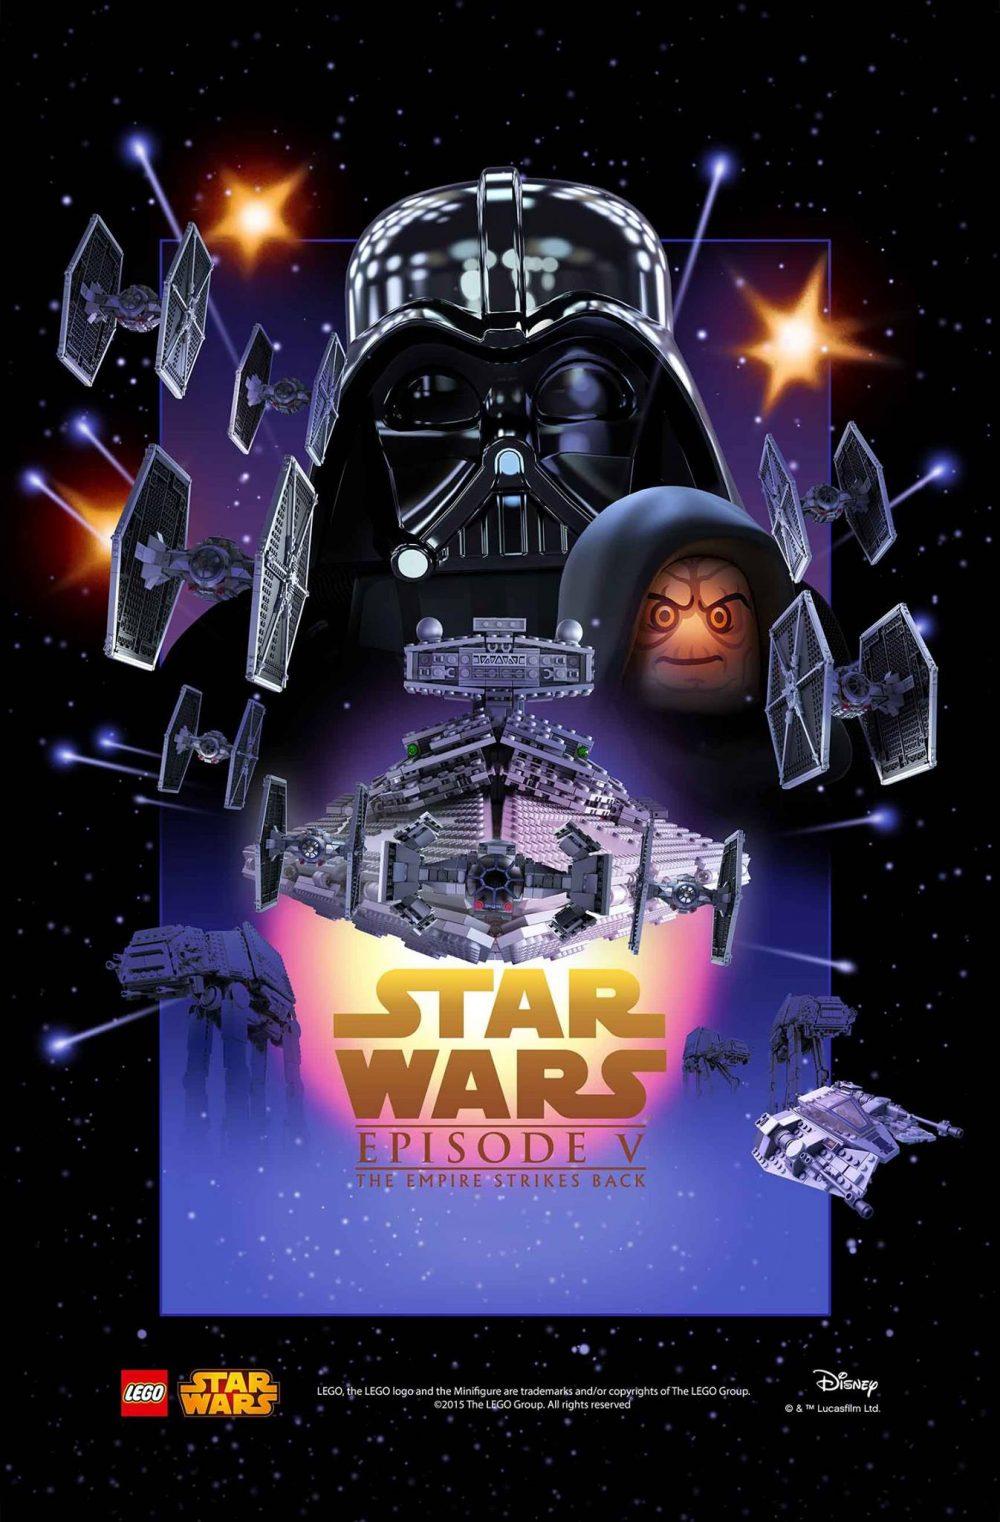 star wars episodio 5 poster lego